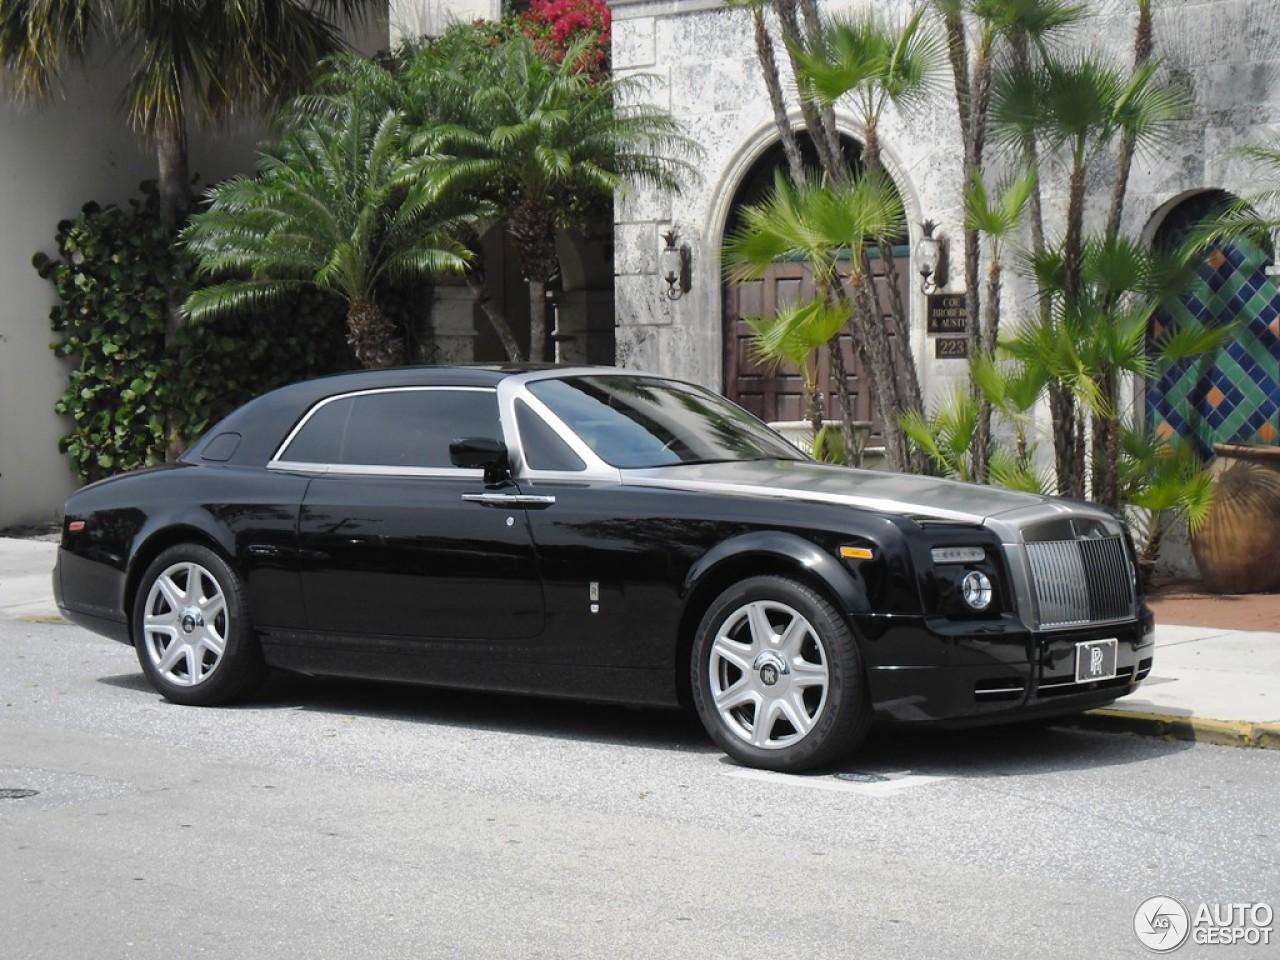 Rolls-Royce Phantom Coupé - 23 March 2013 - Autogespot